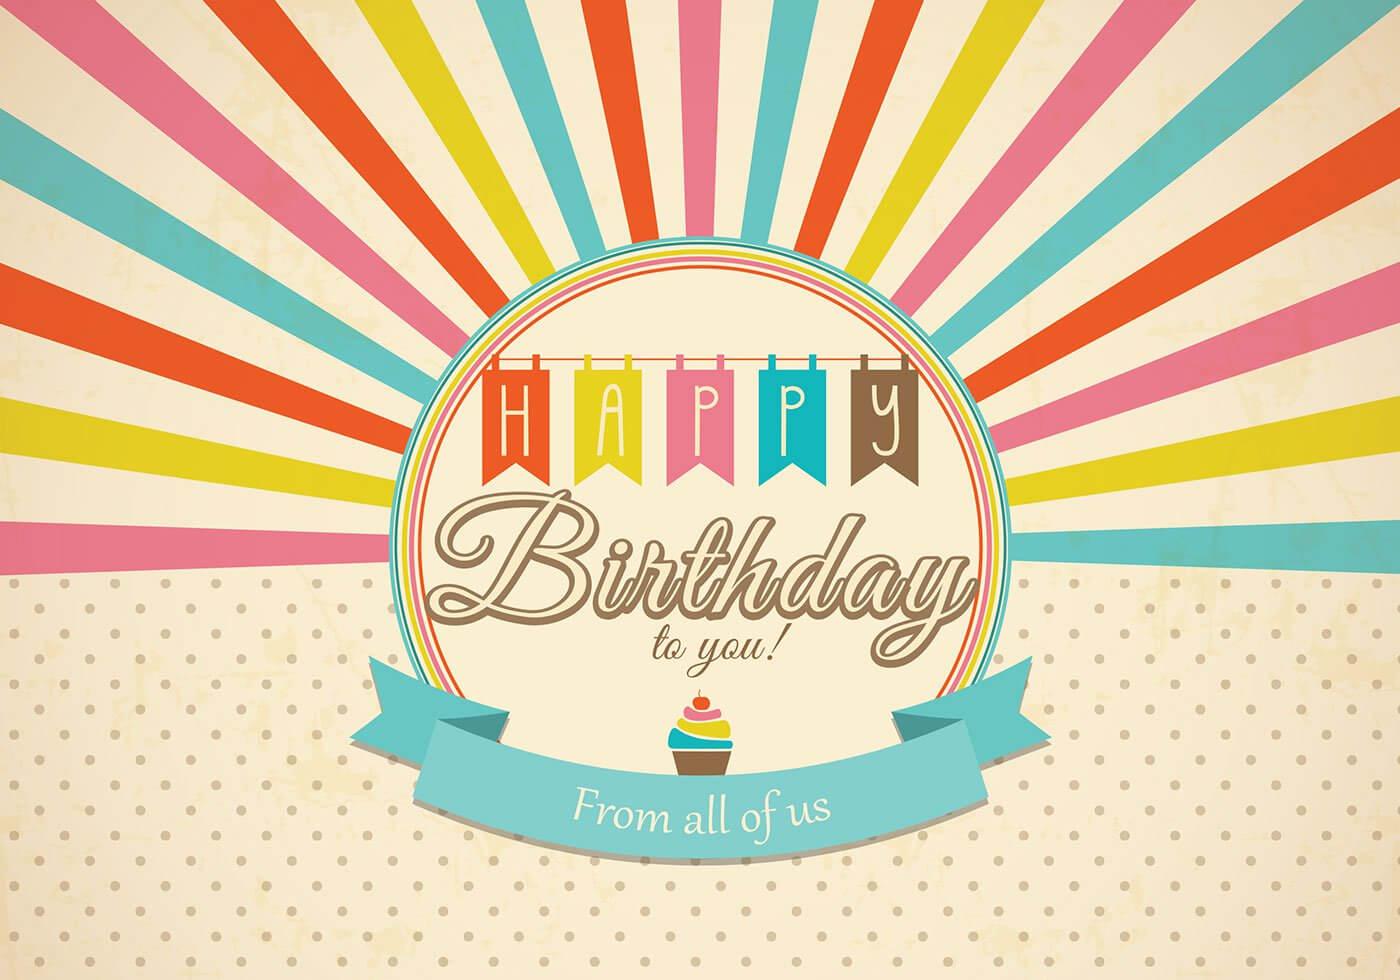 Retro Happy Birthday Card Psd - Free Photoshop Brushes At In Photoshop Birthday Card Template Free